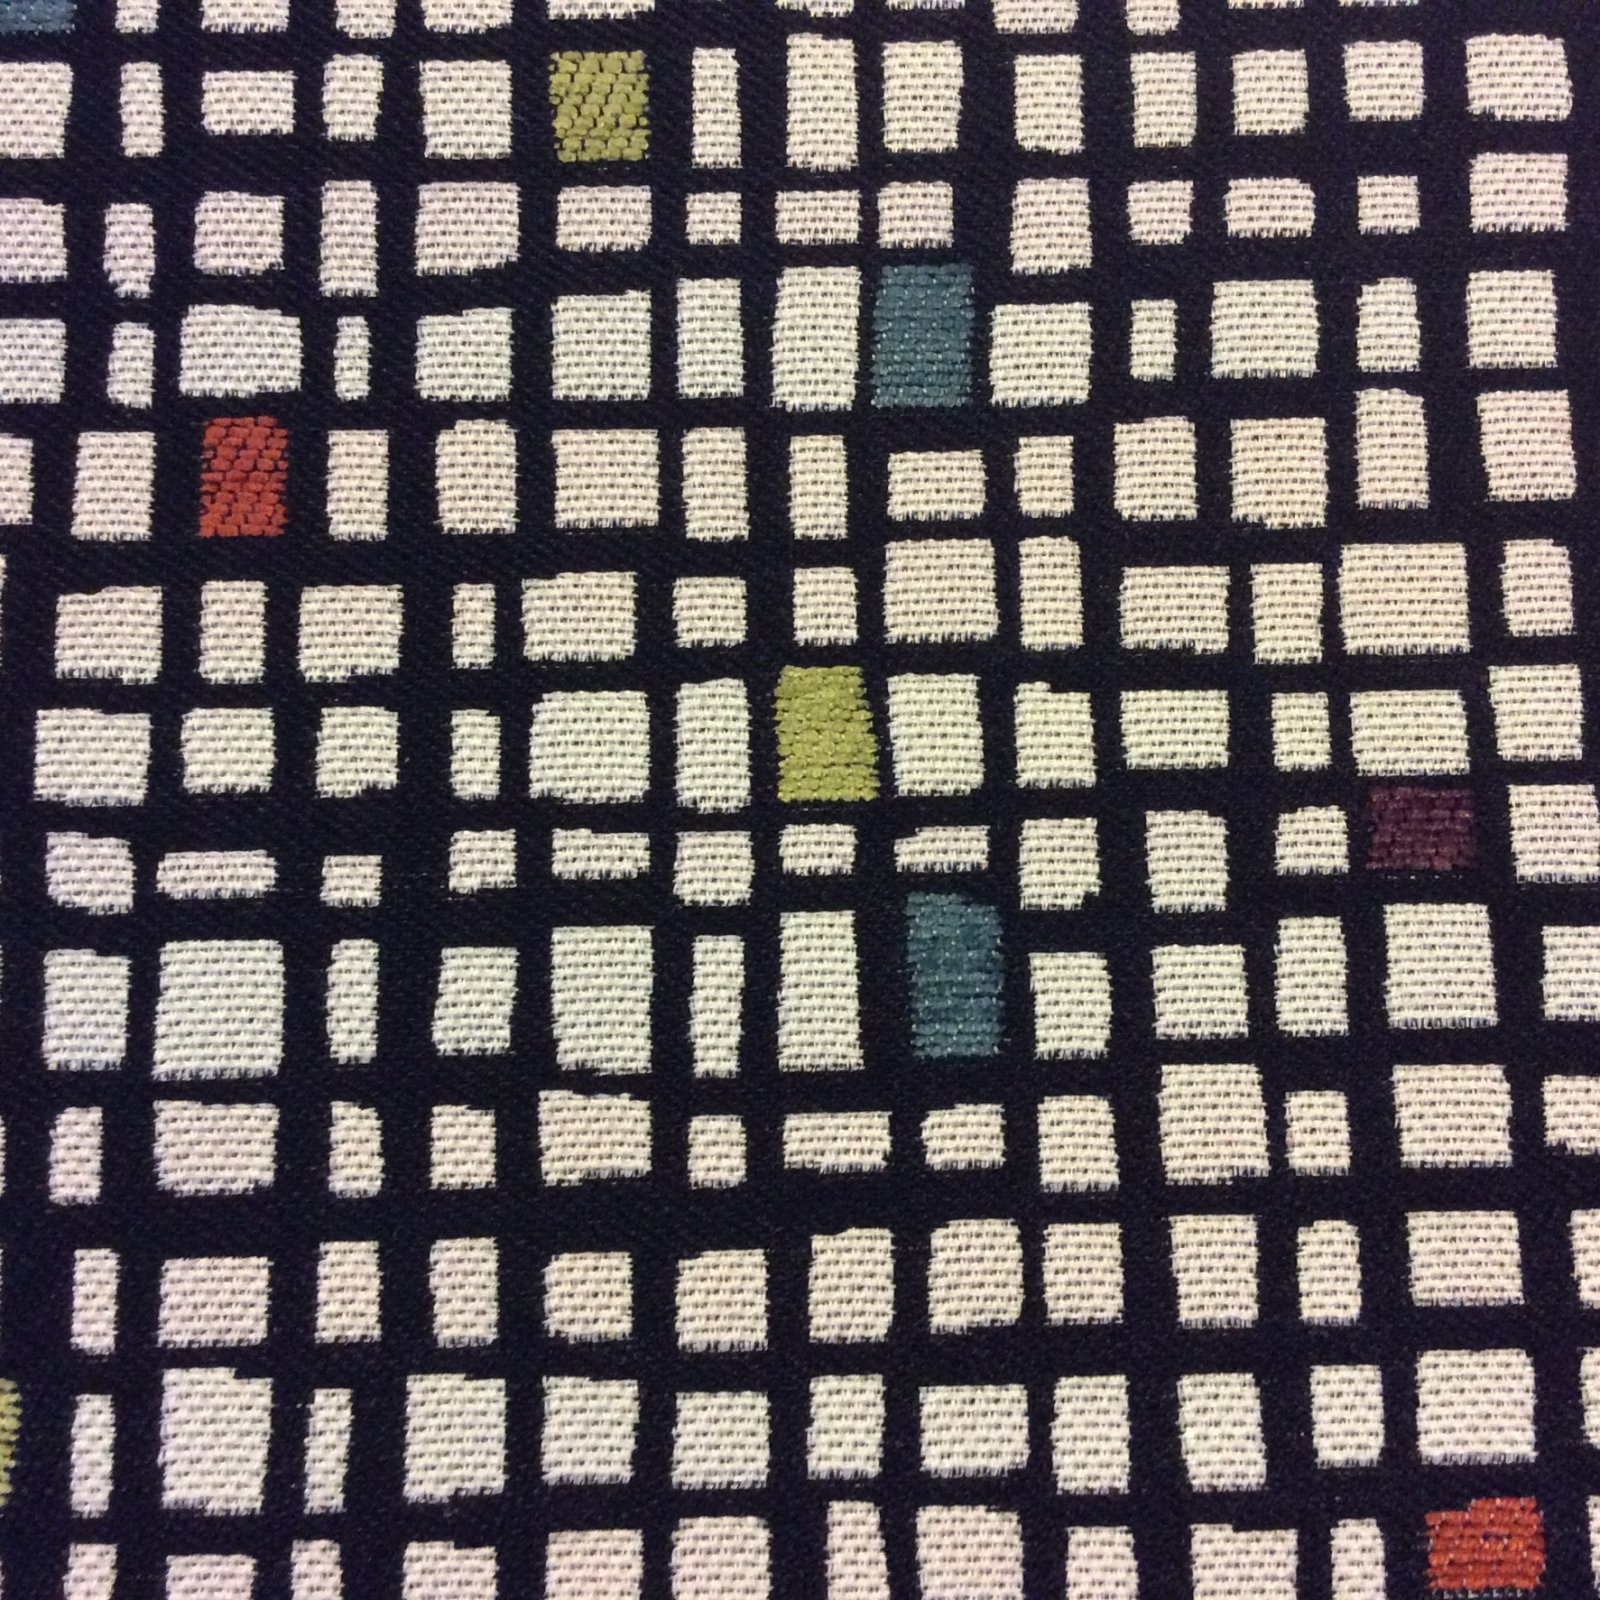 Modern Geometric Check Heavy Woven Home Dec Upholstery Fabric Nl78